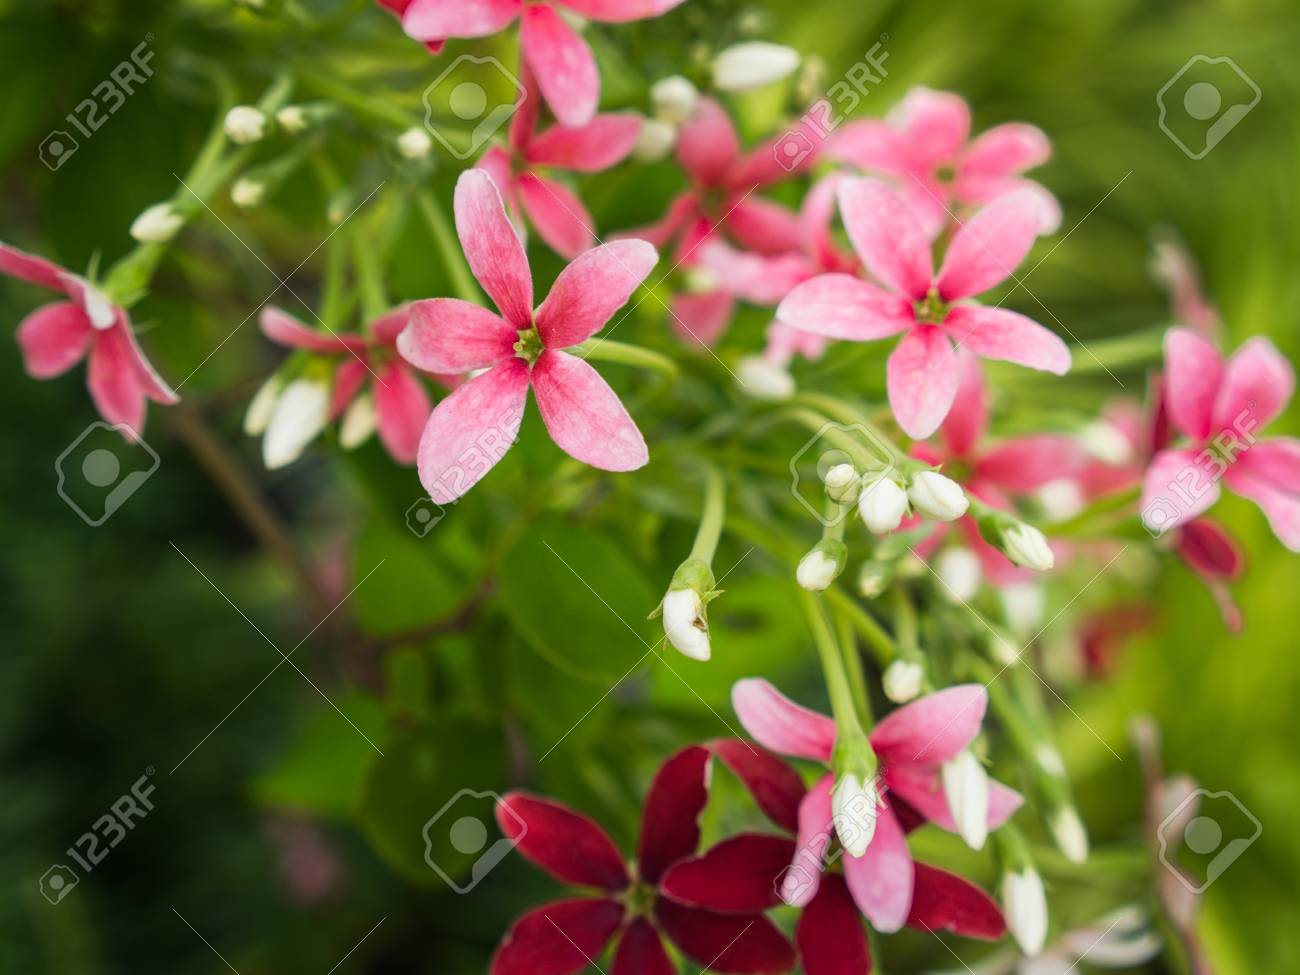 Pink white red rangoon creeper flowers blooming in the garden stock pink white red rangoon creeper flowers blooming in the garden stock photo 92117917 mightylinksfo